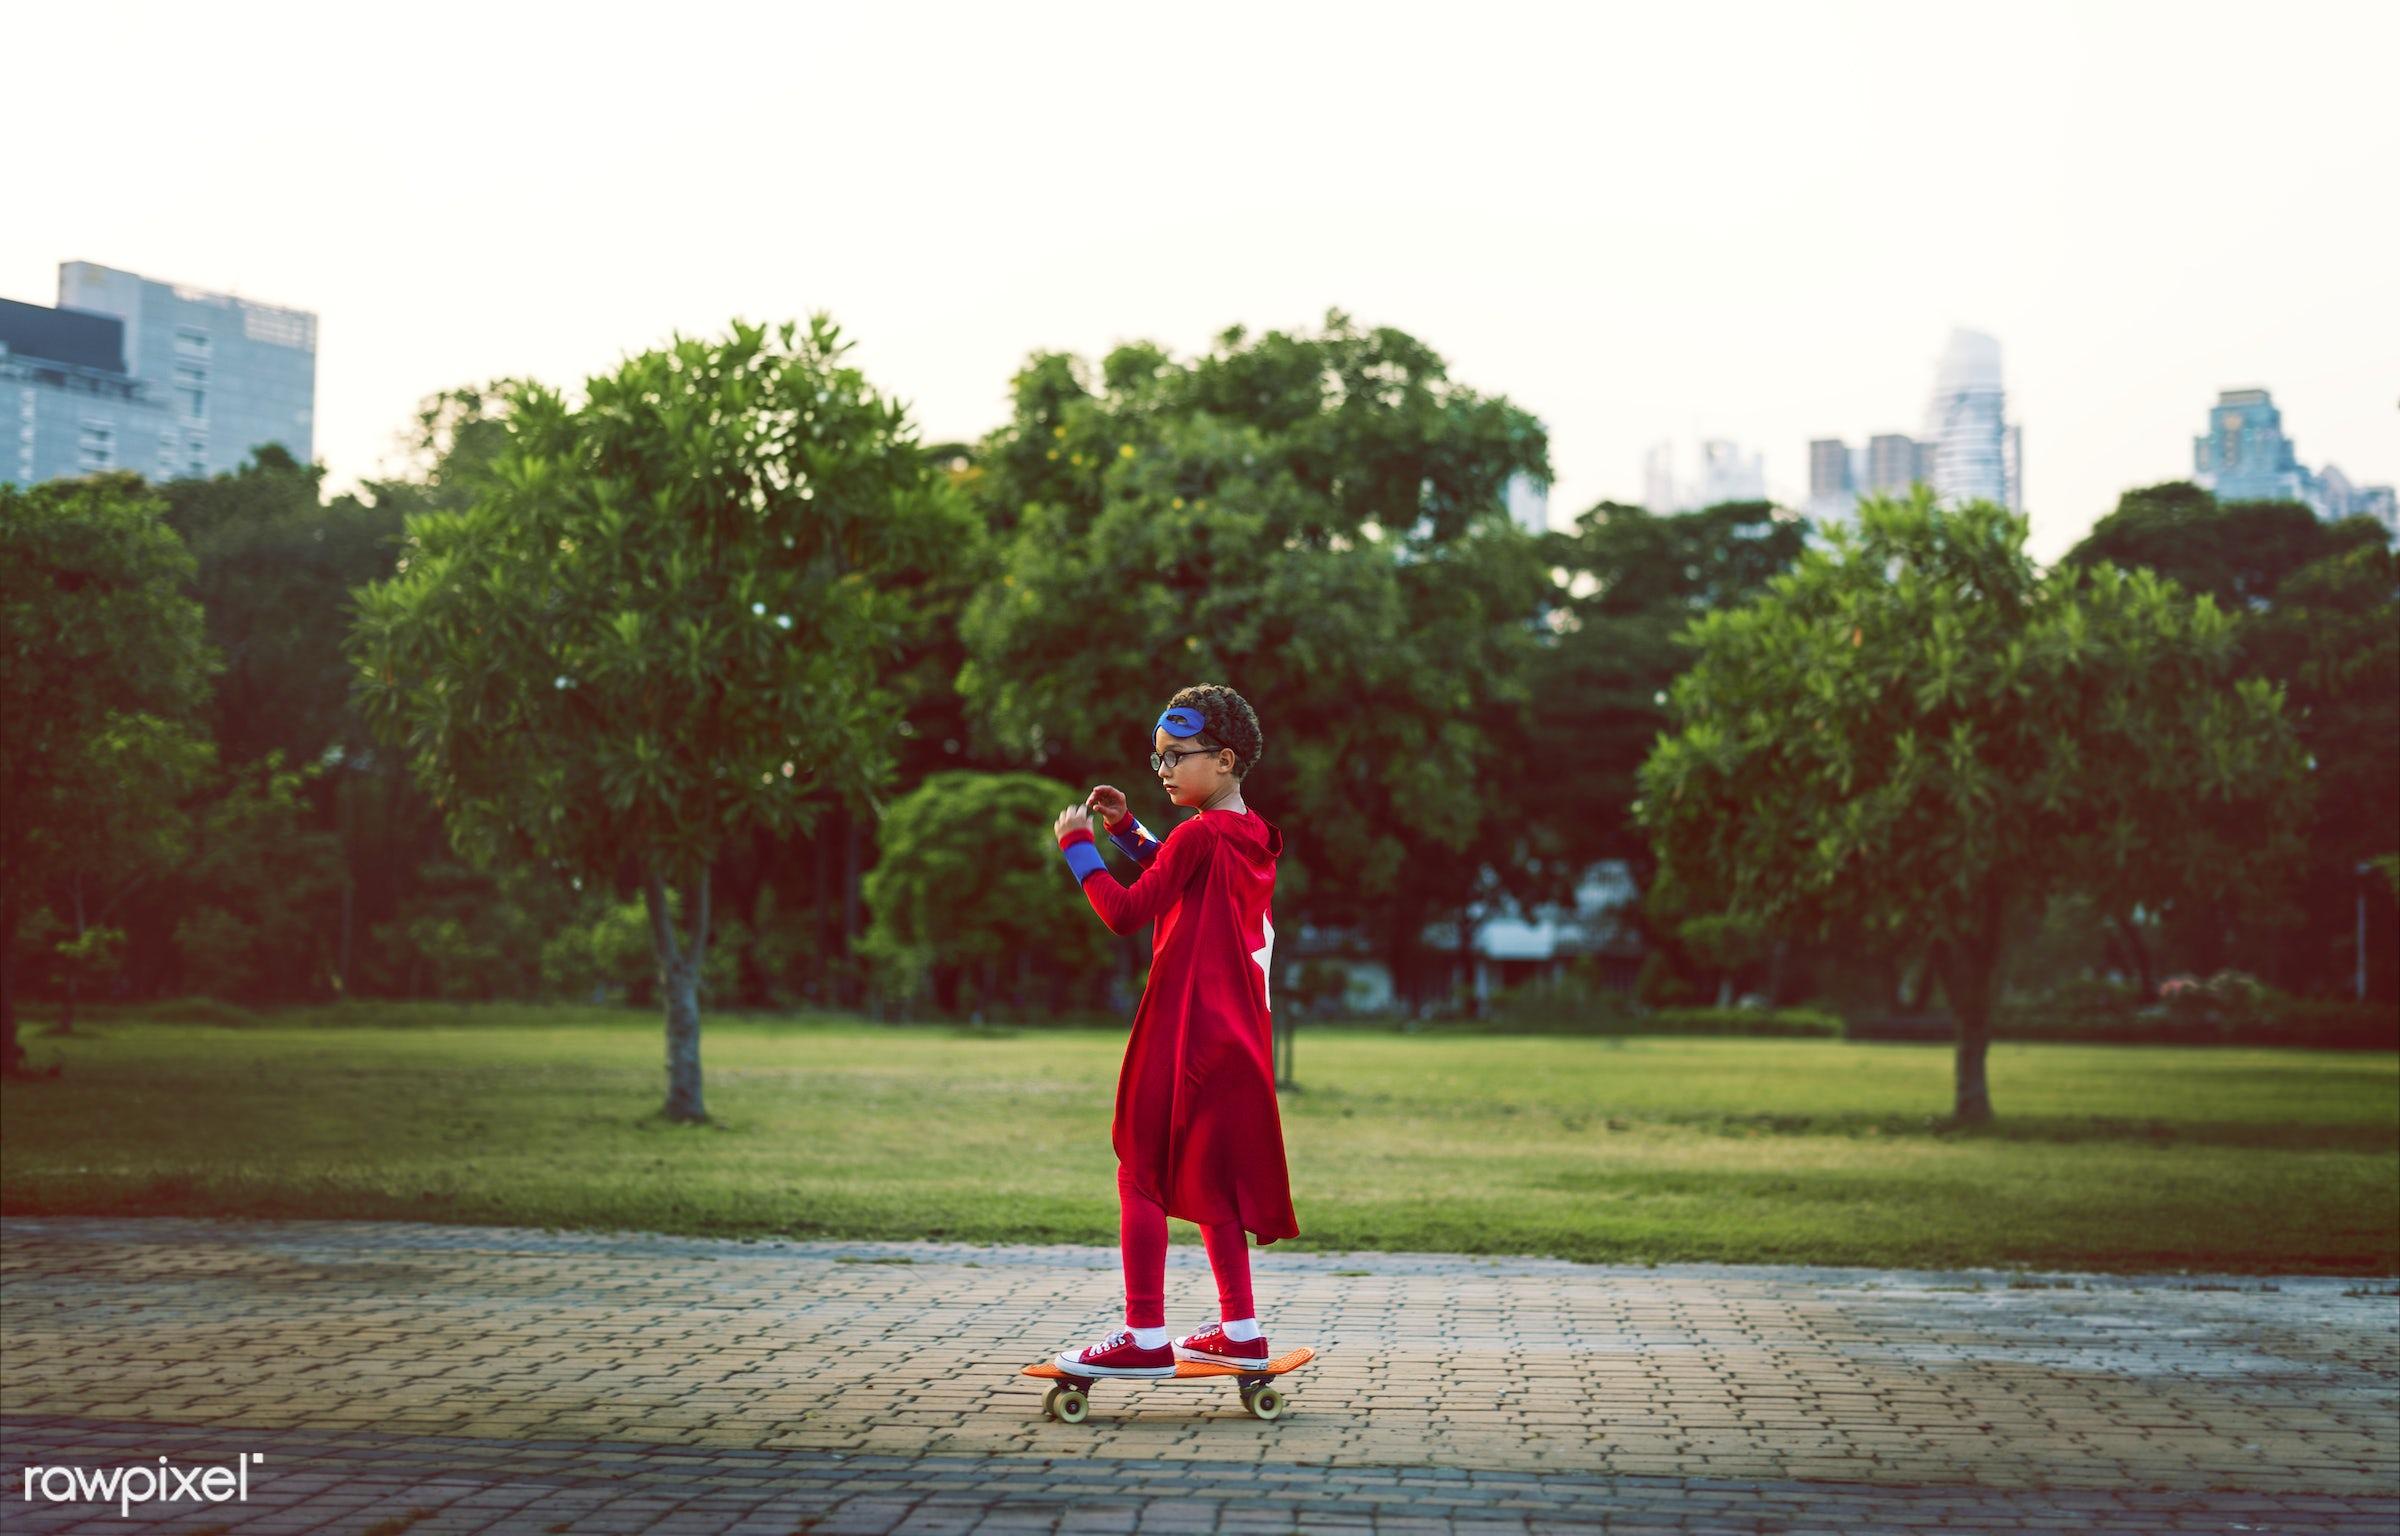 Superhero boy on a skateboard - superhero, costume, action, activities, aspiration, boy, casual, cheerful, child, childhood...